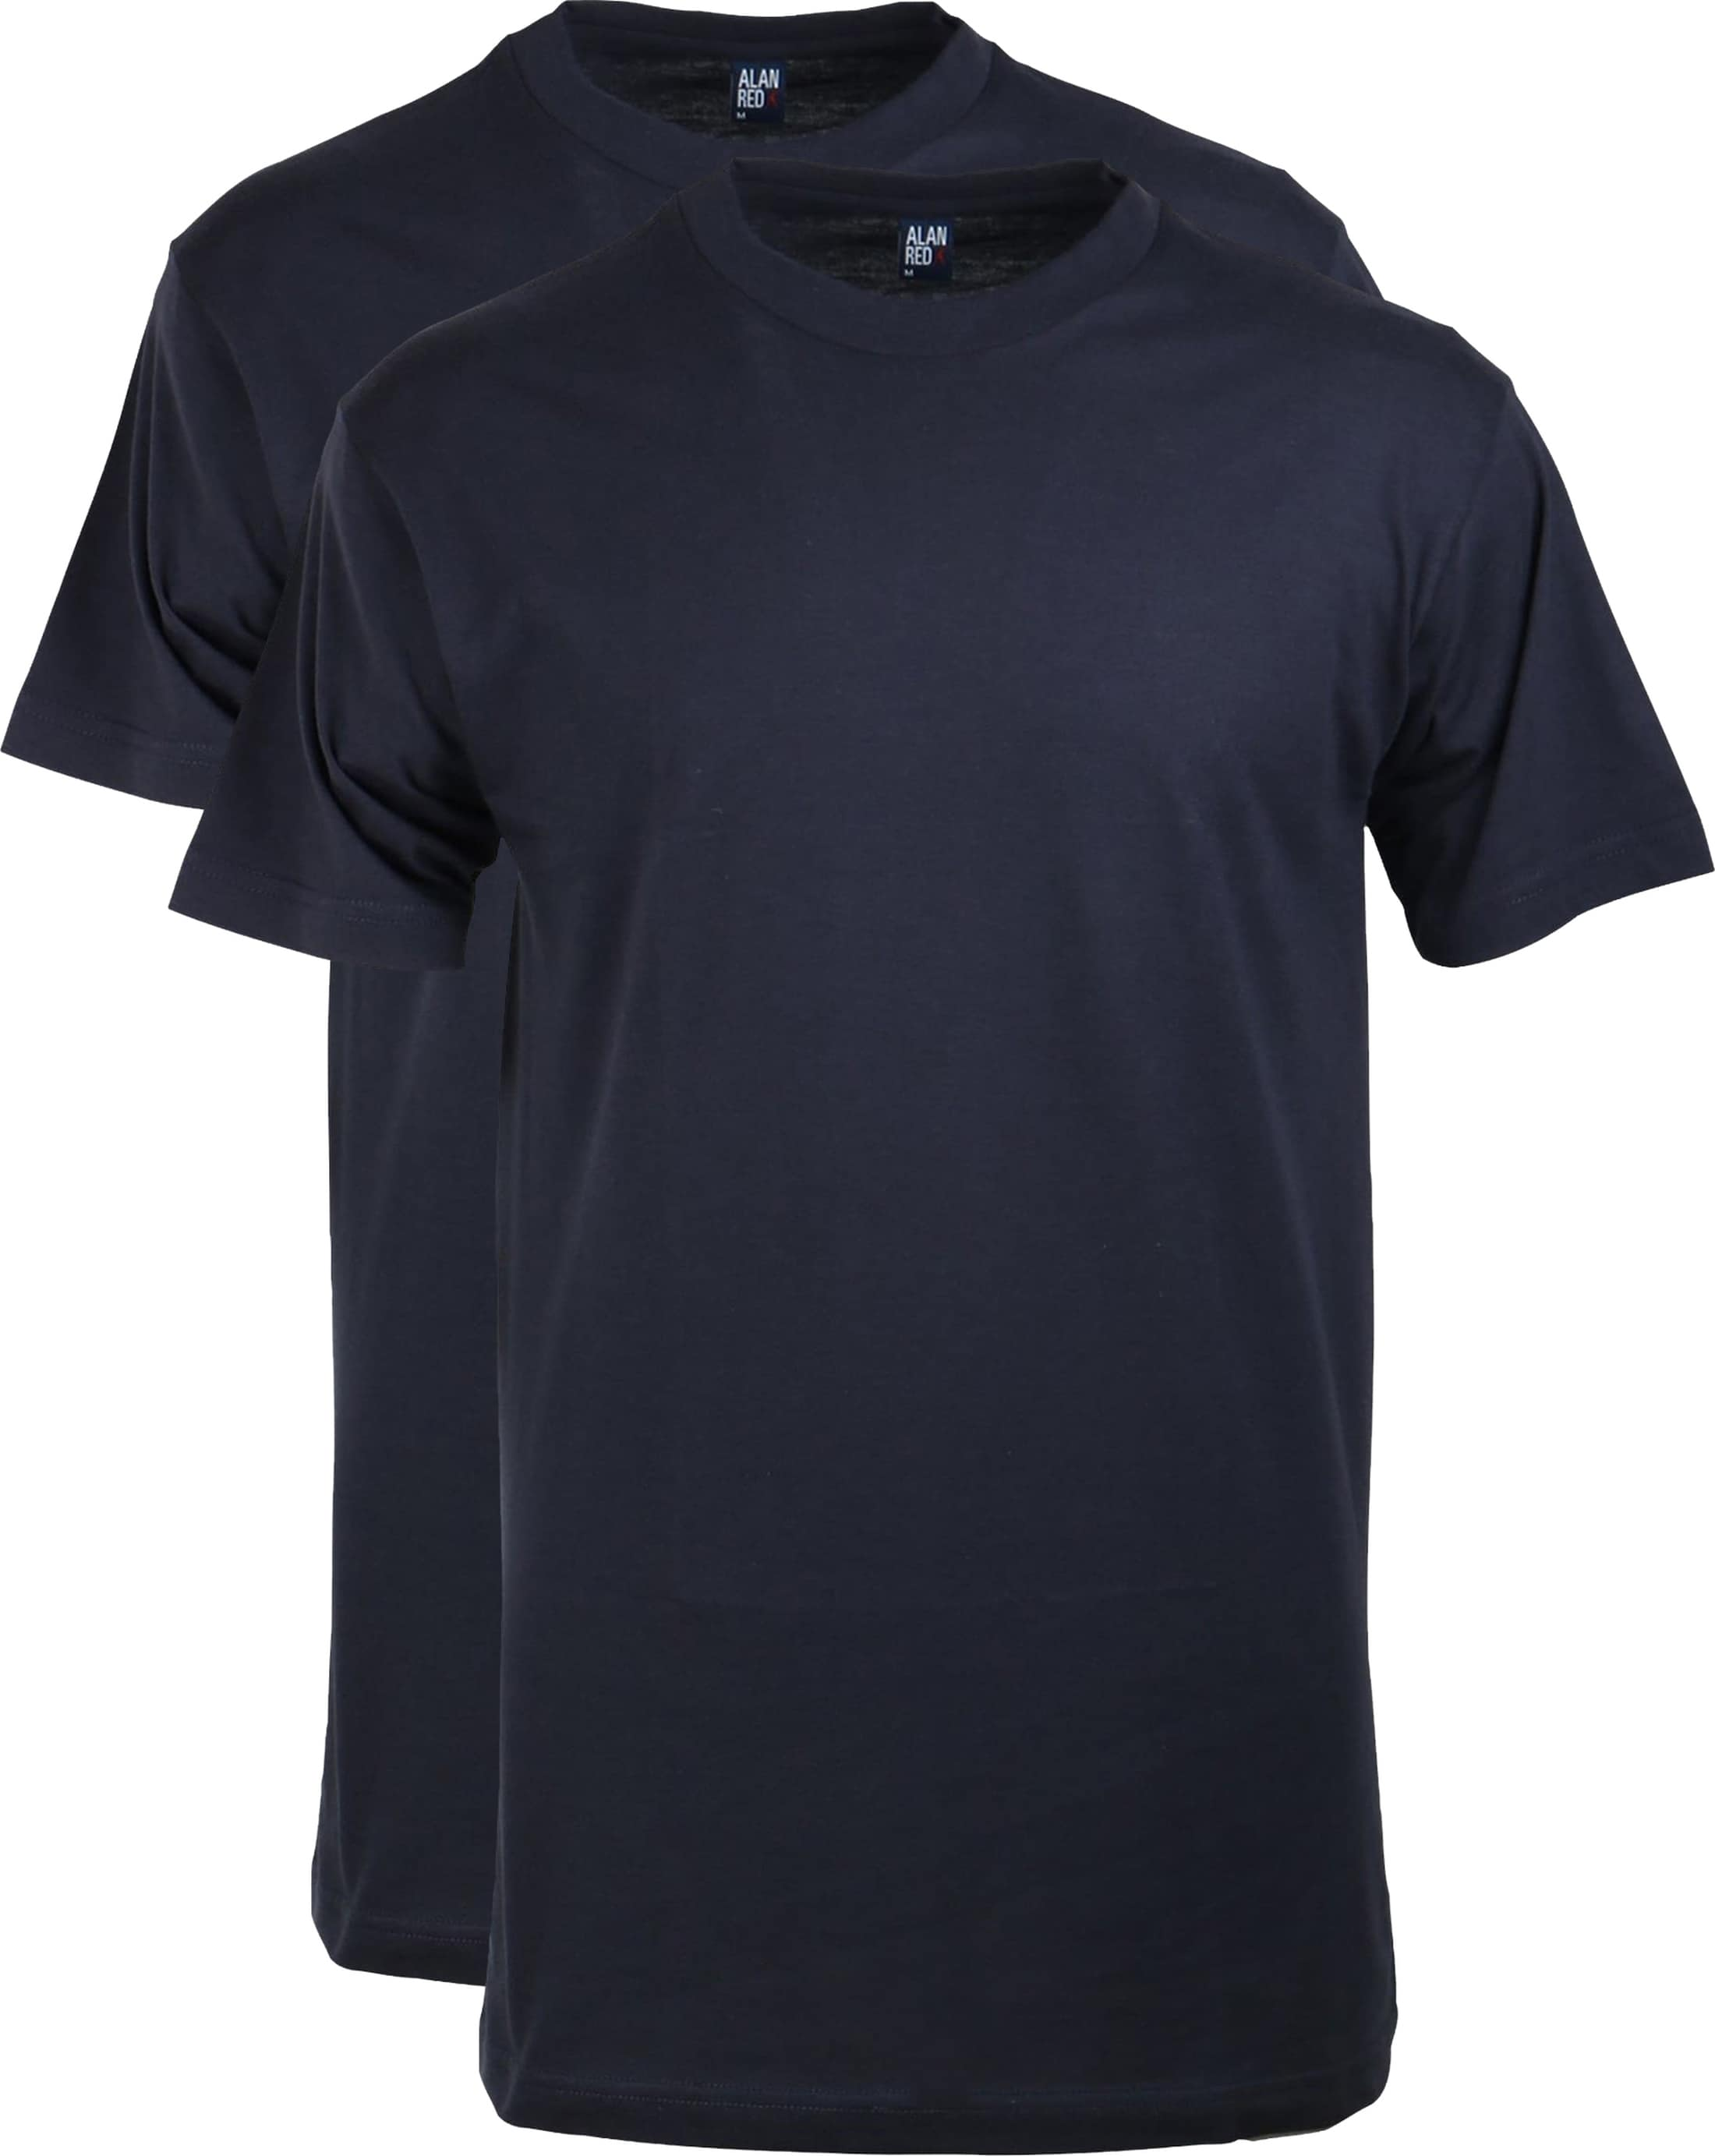 Alan Red T-shirt Virginia O-Neck Navy 2-Pack